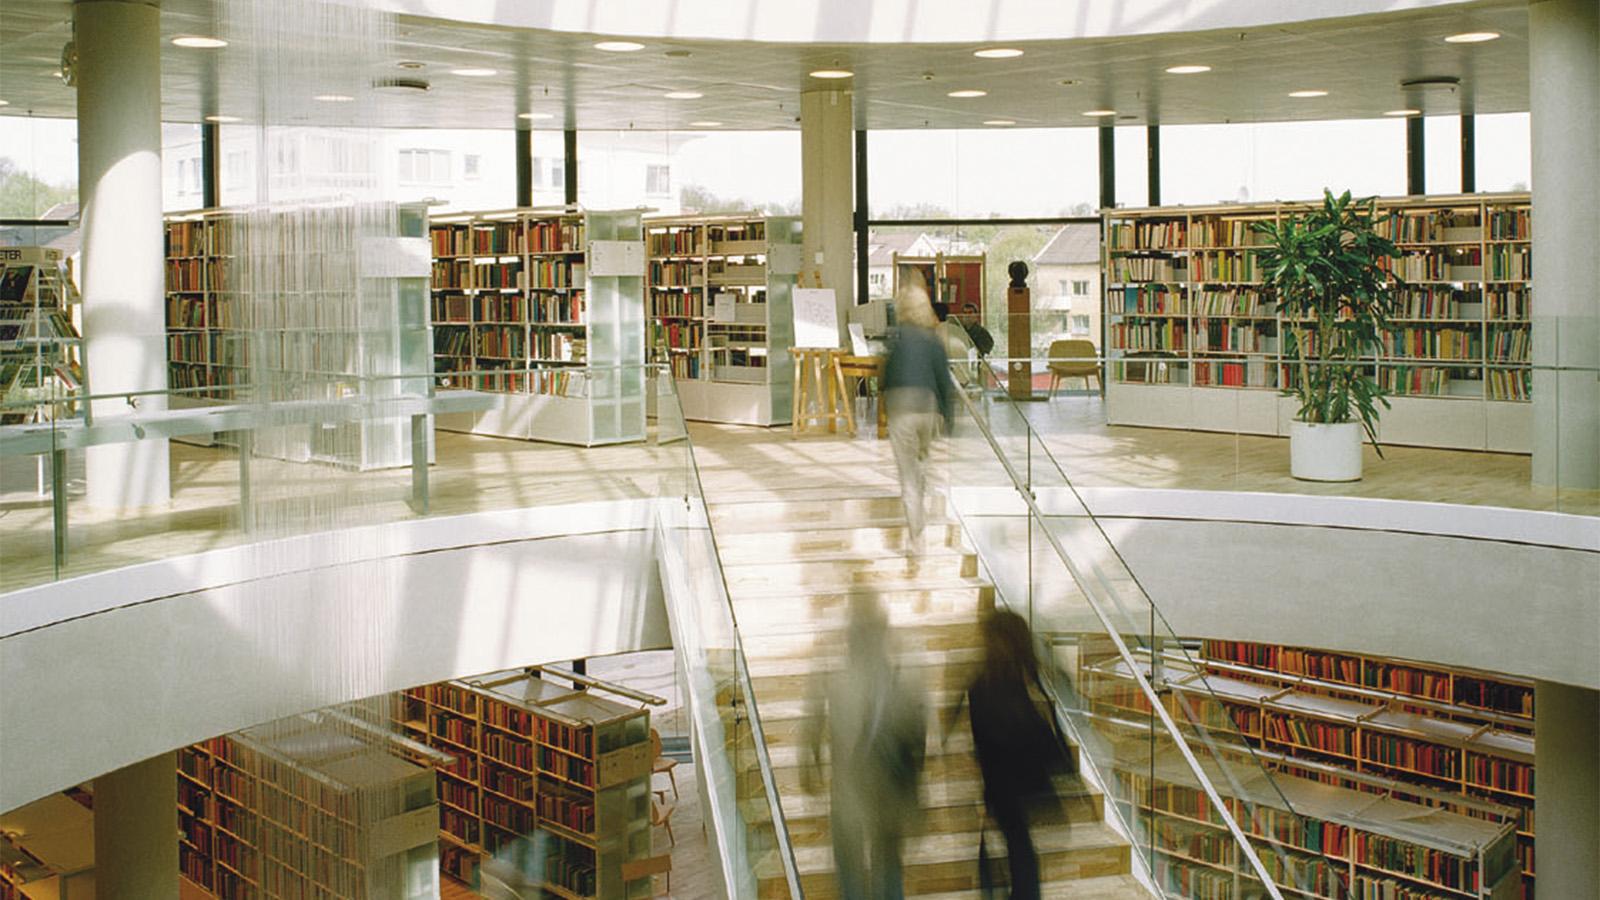 City Library of Växjö, Sweden